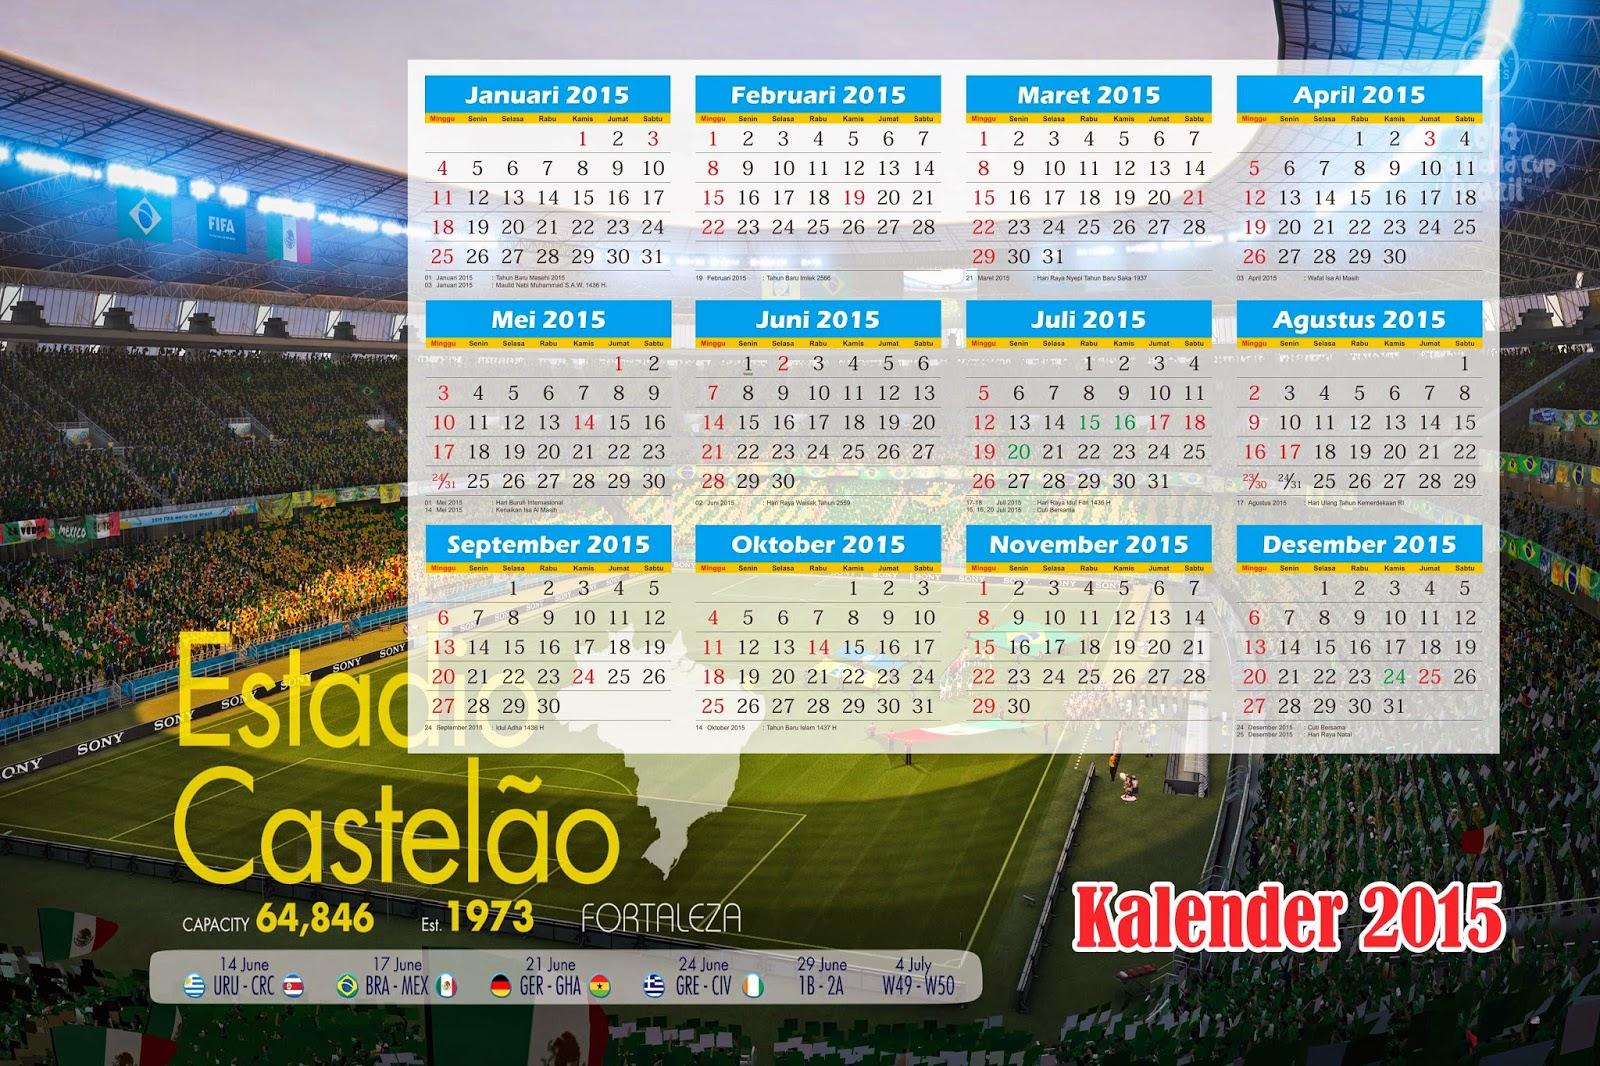 Info Indonesiana: Download Kalender 2015 full CDR format